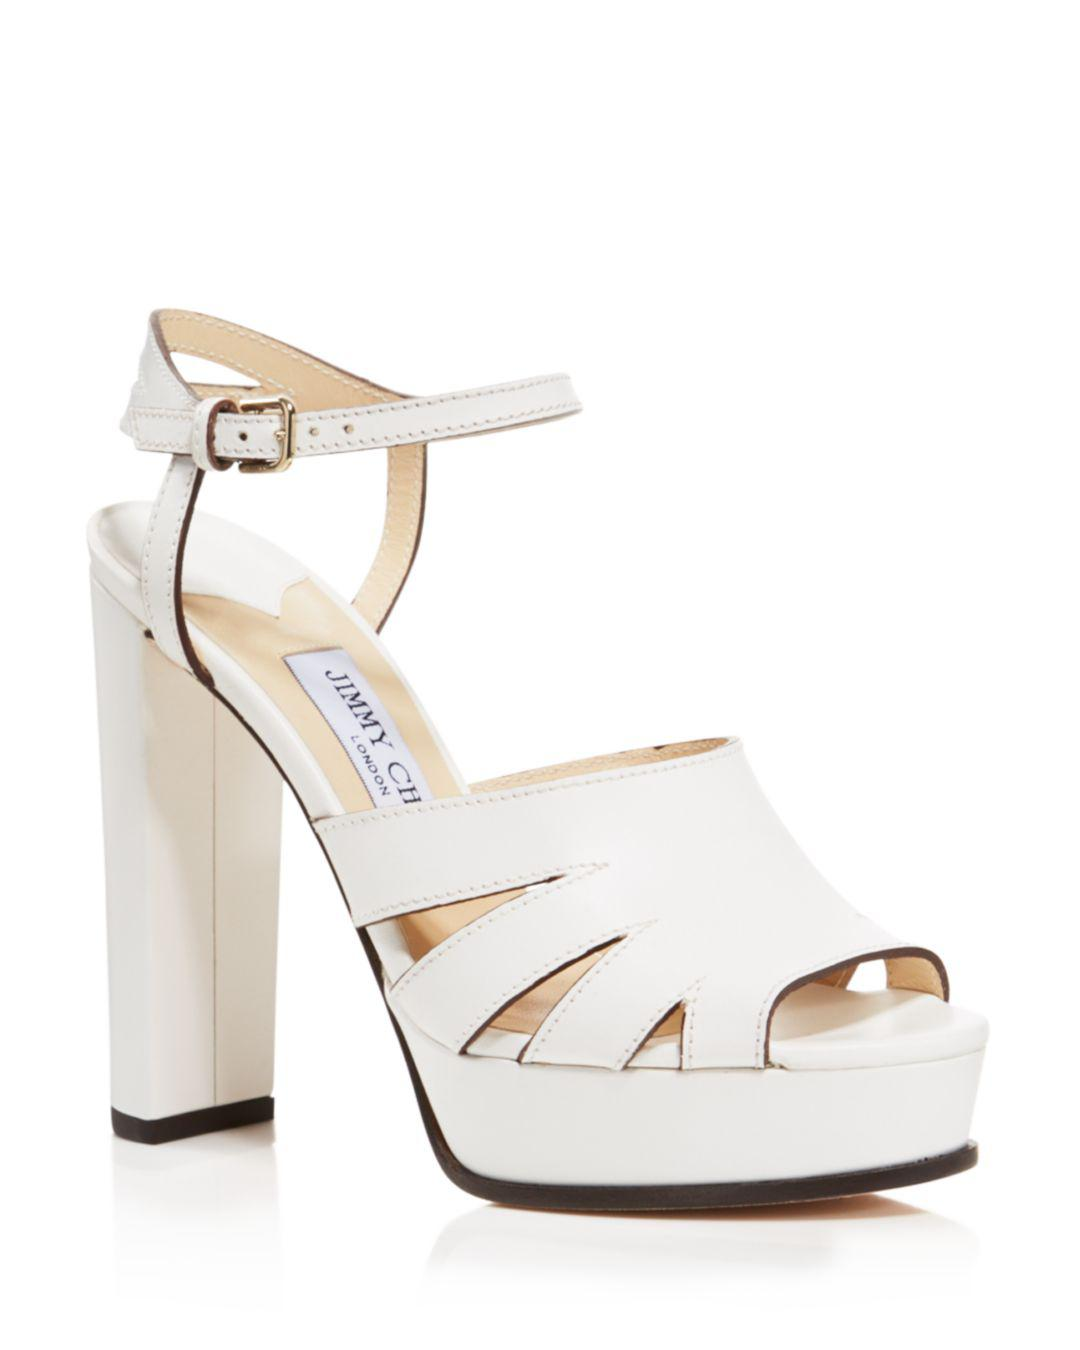 ca81ff0f013 Lyst - Jimmy Choo Women s Hermione 120 Leather Platform High-heel ...